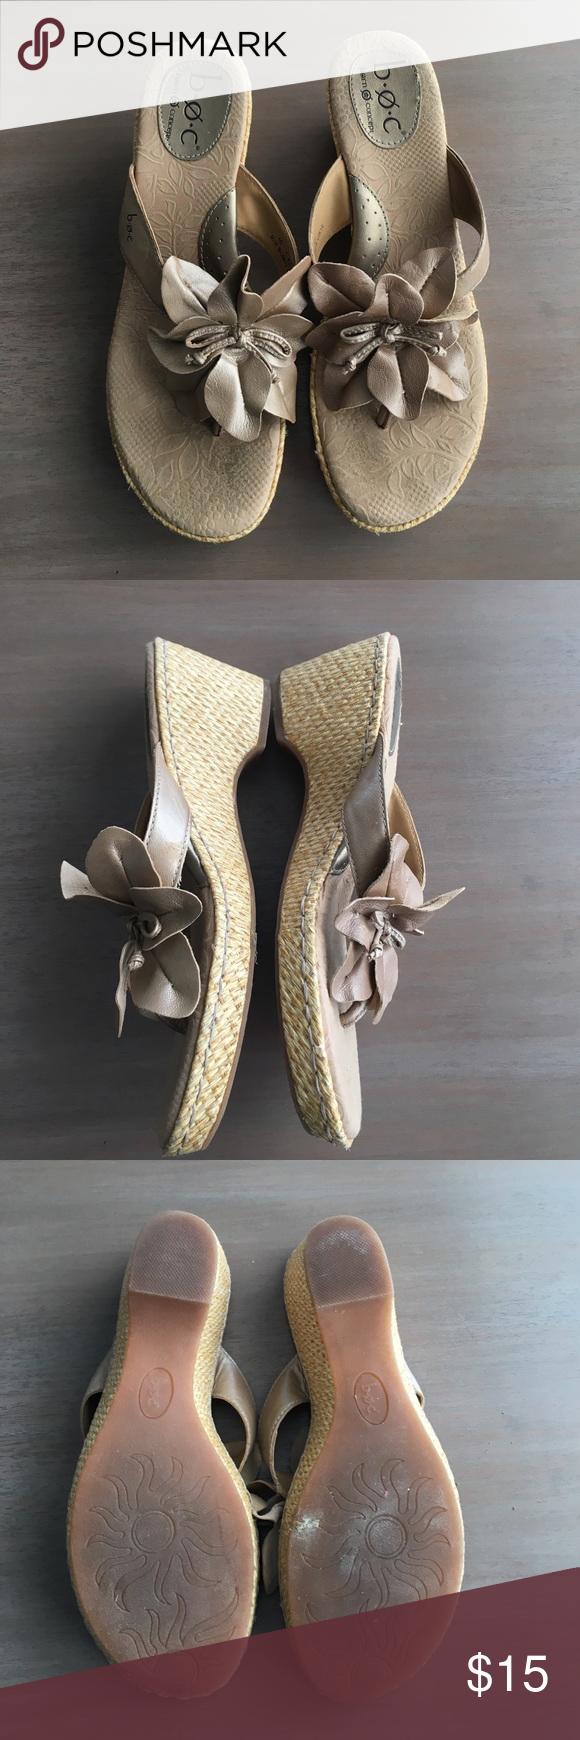 Born Concept Metallic Wedges Gently used Born Concept Metallic Wedges. Size 10. Born Shoes Wedges